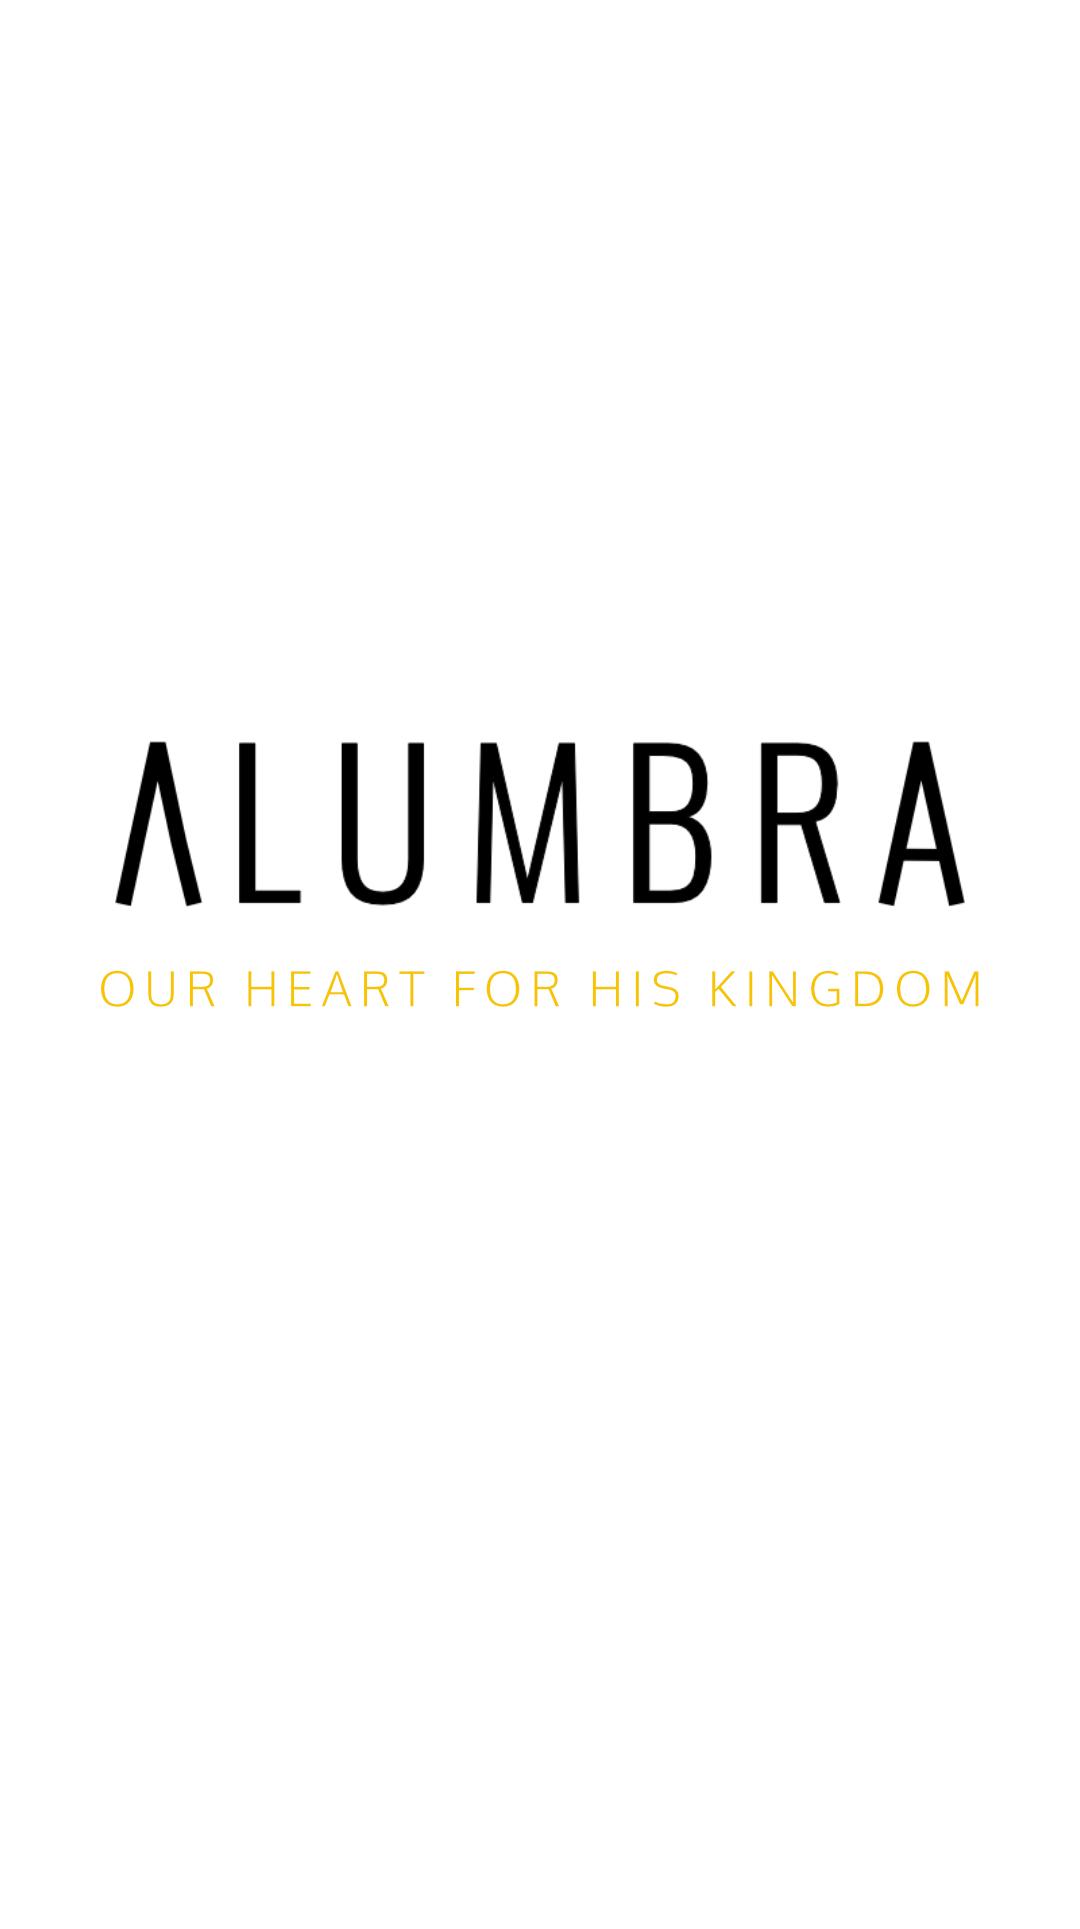 Alumbra logo and tagline